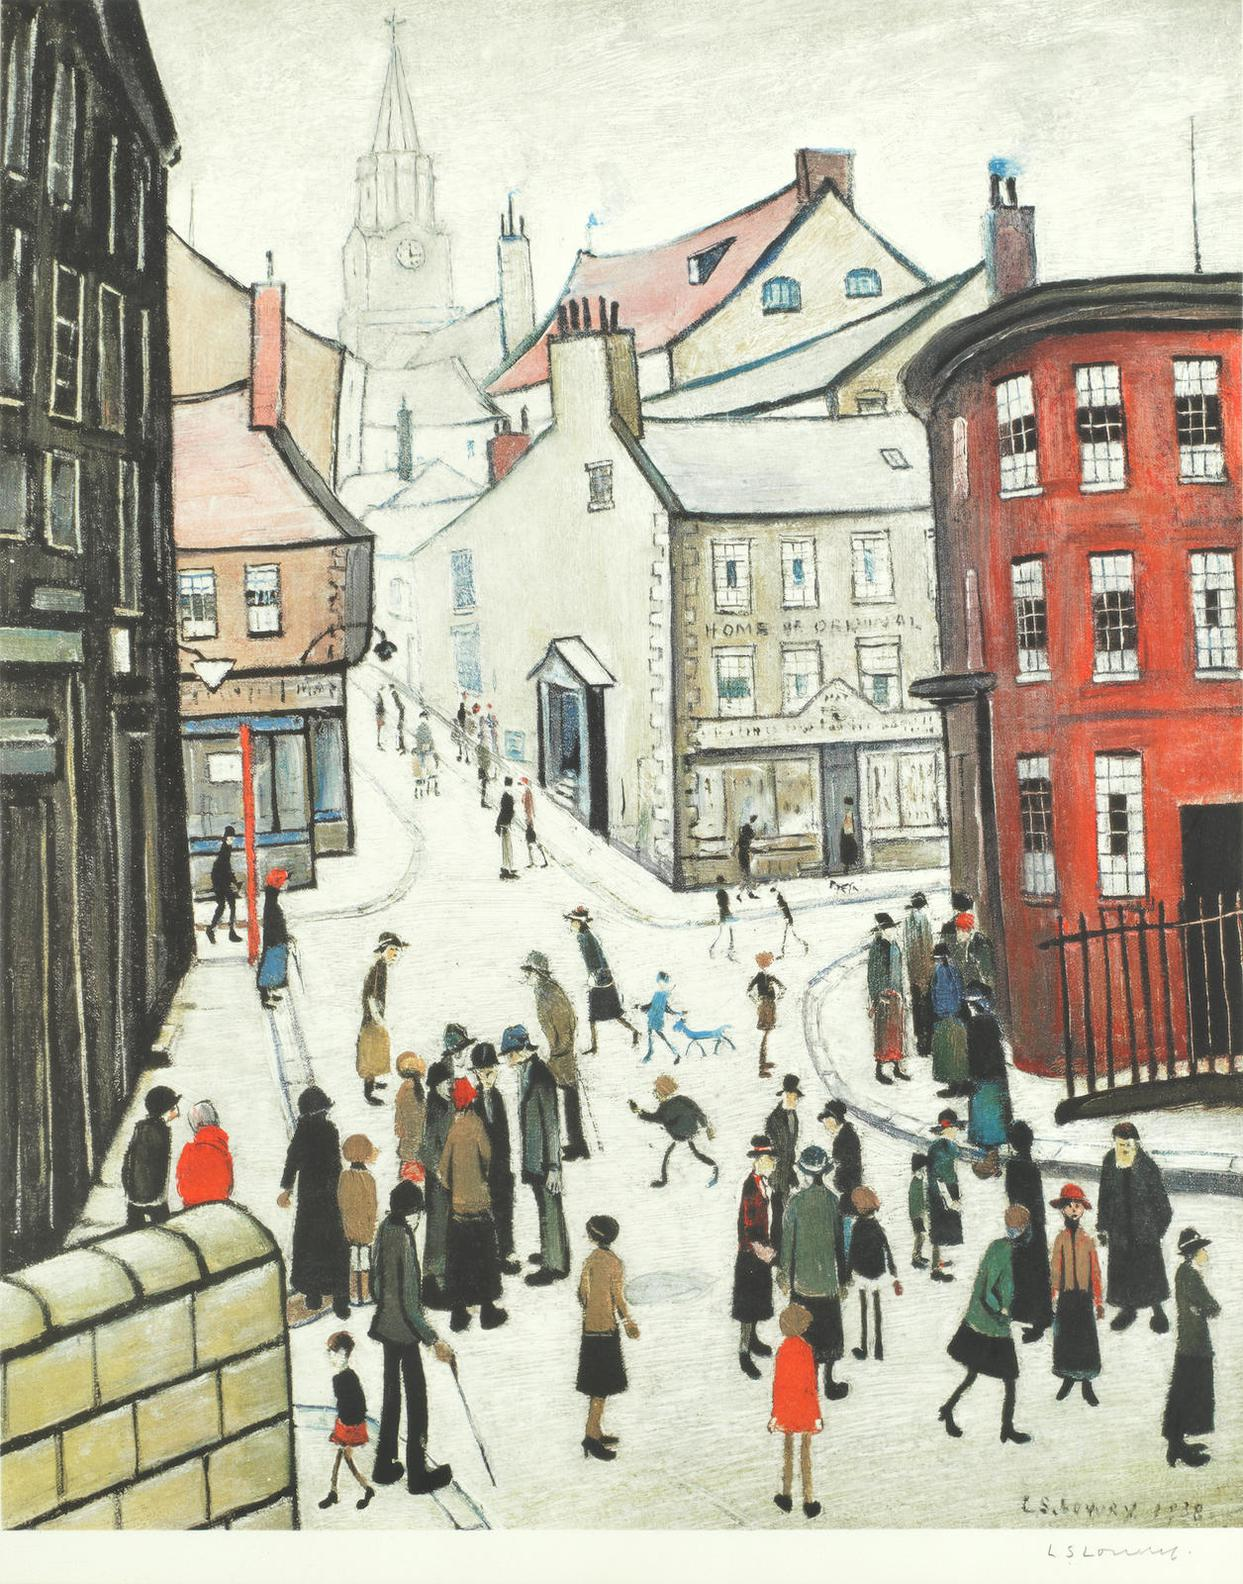 Laurence Stephen Lowry-Berwick-Upon-Tweed-1973